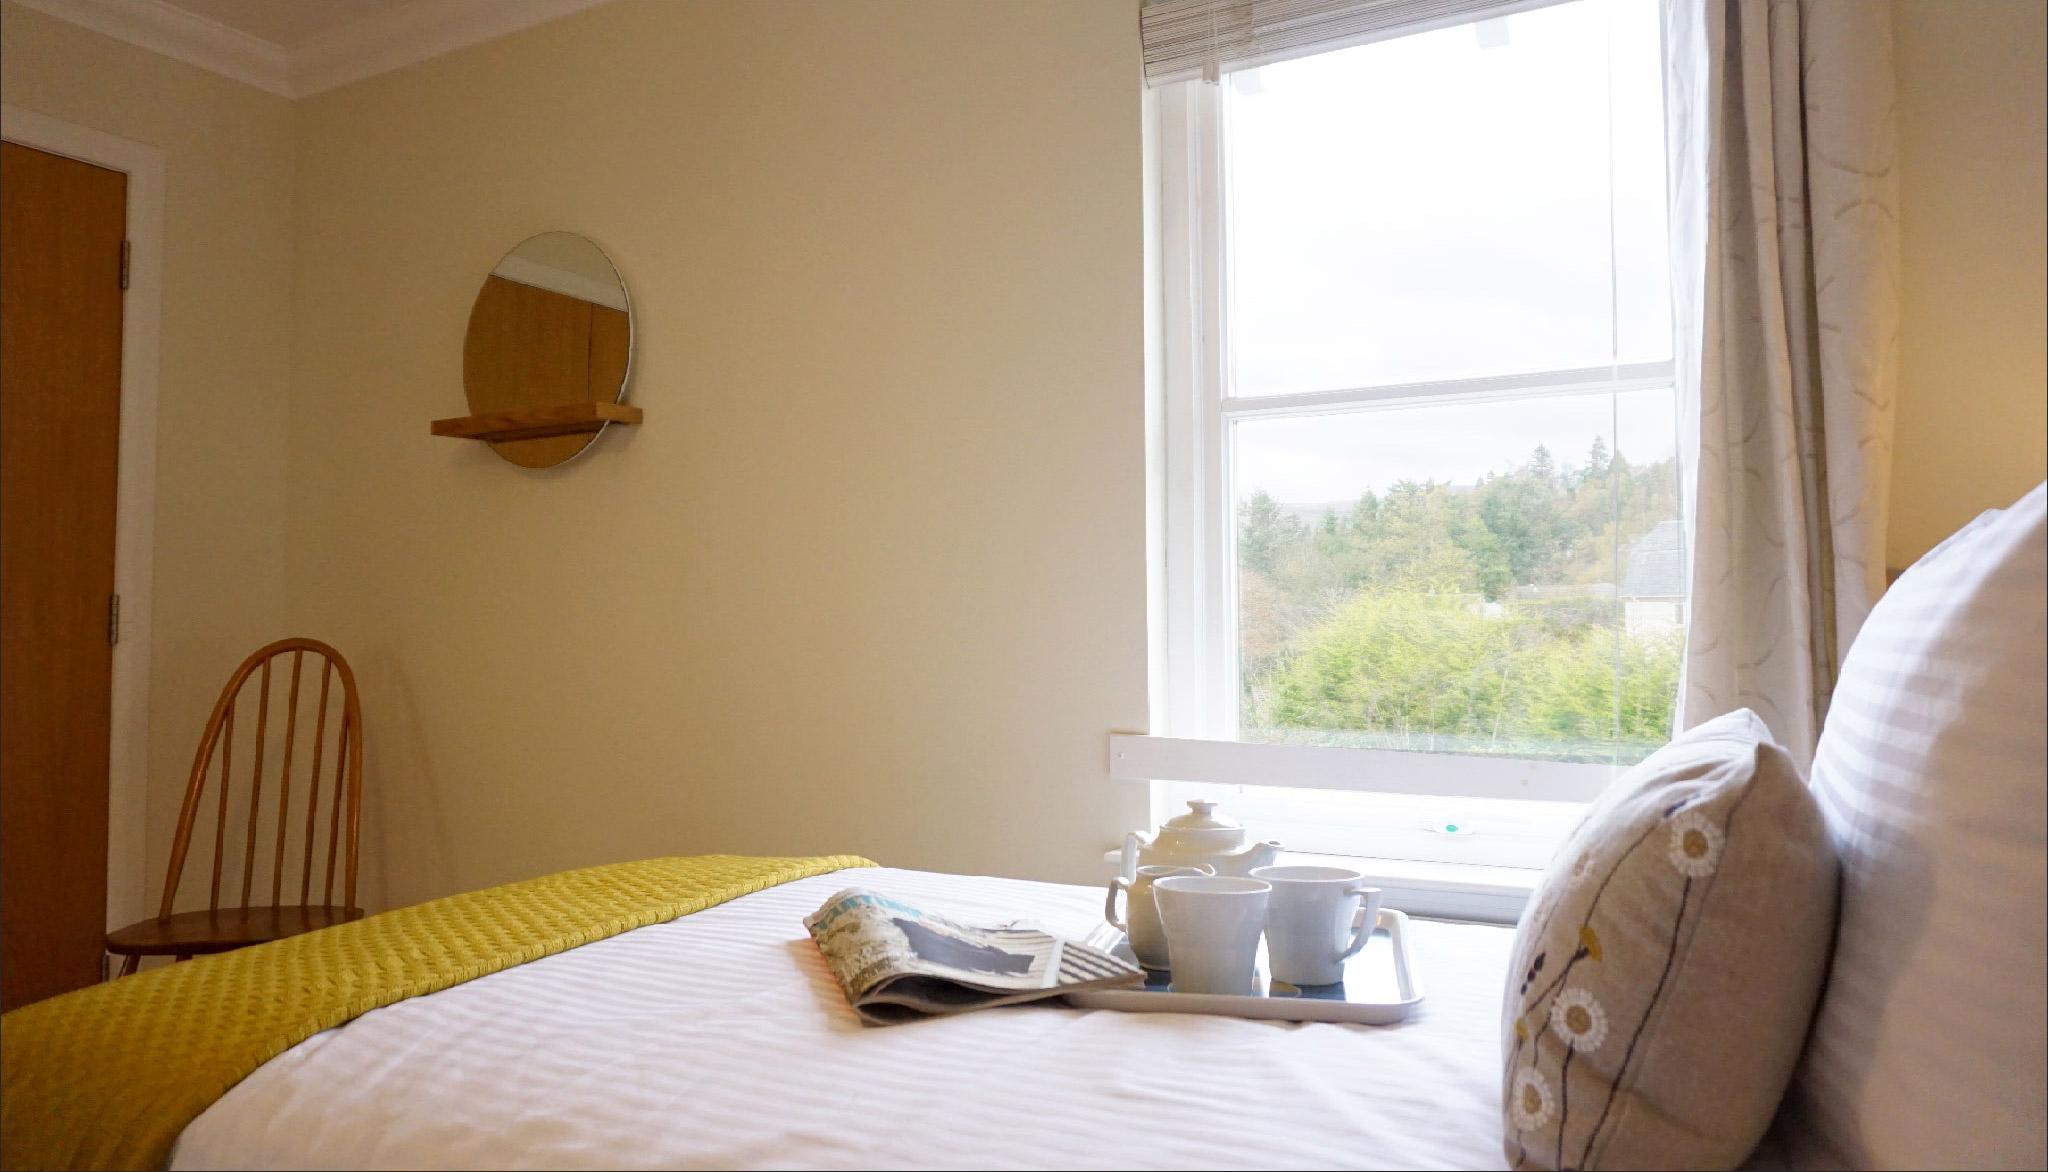 The_Hoolet_Crieff-Bedroom_3-2.jpg